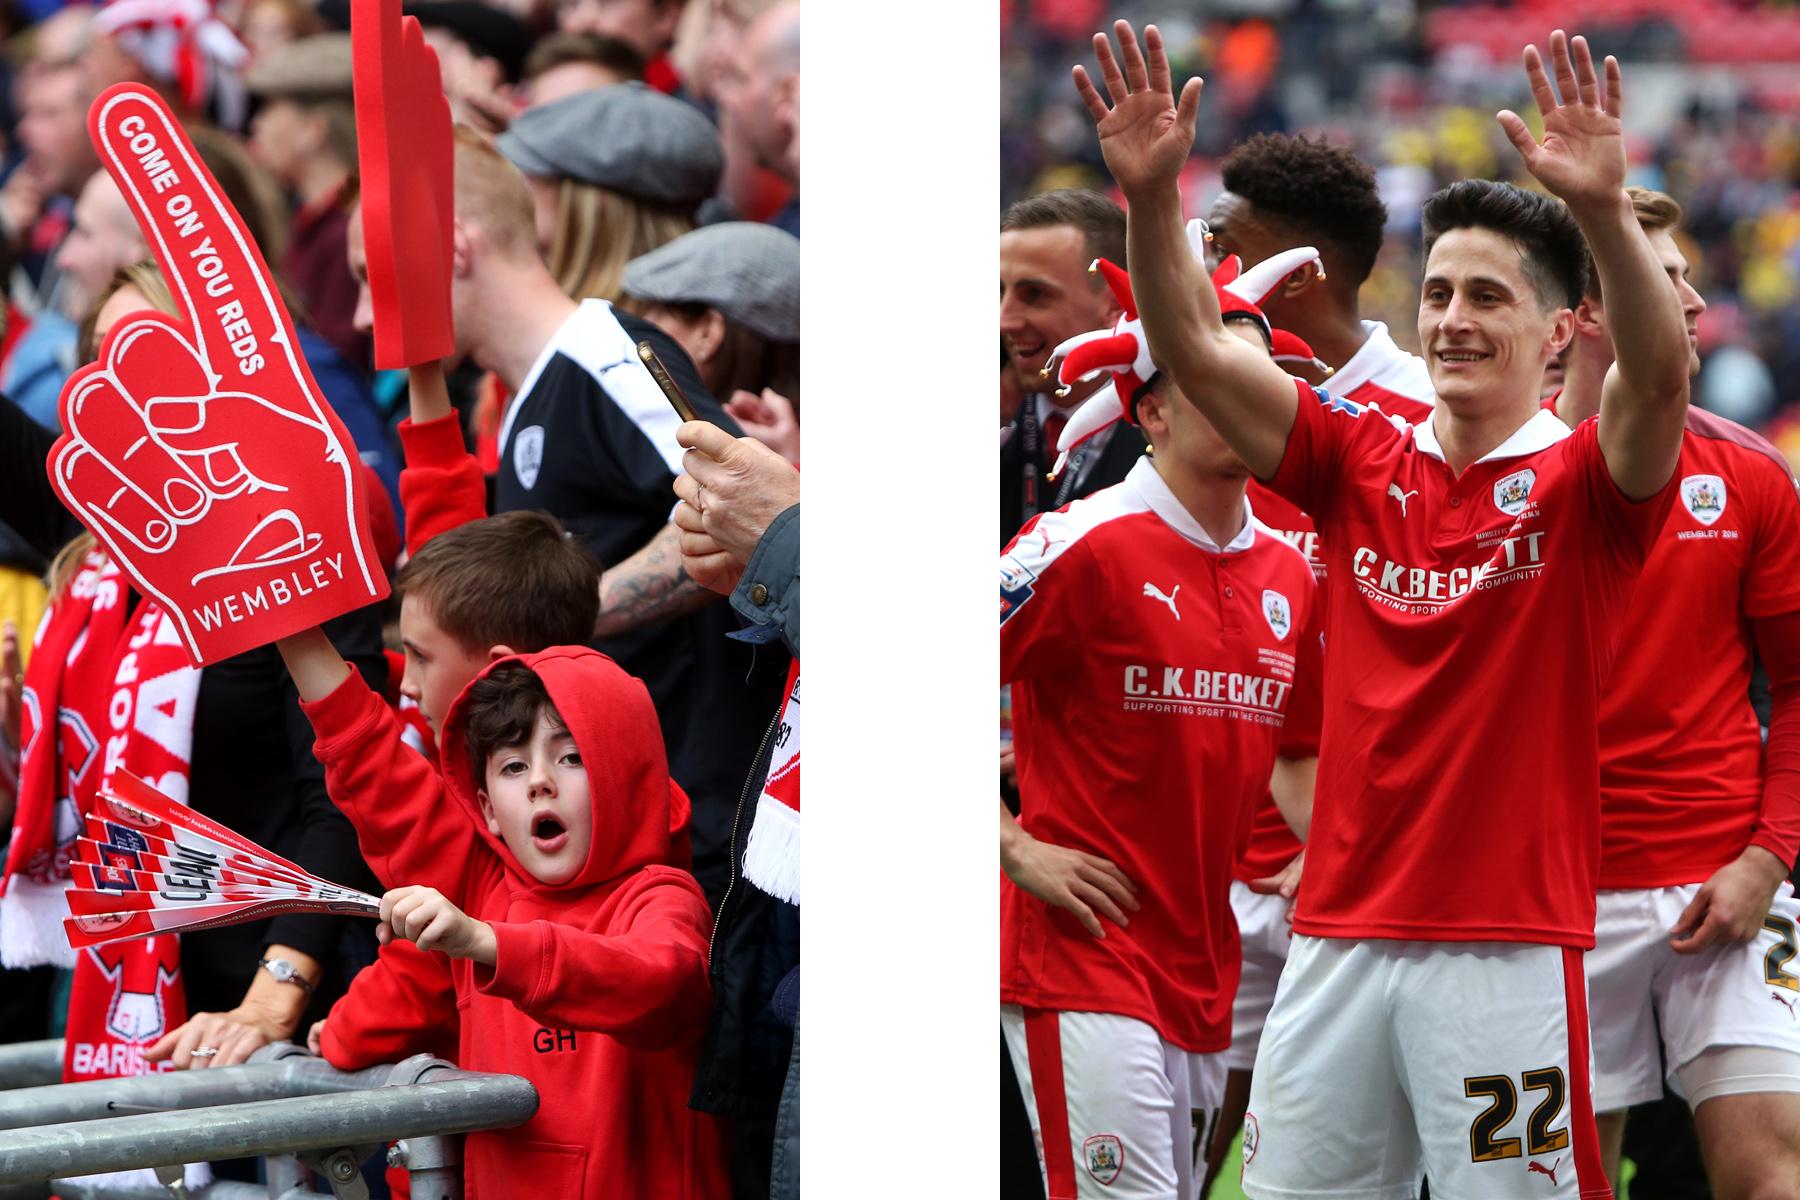 PR_Wembley22.jpg